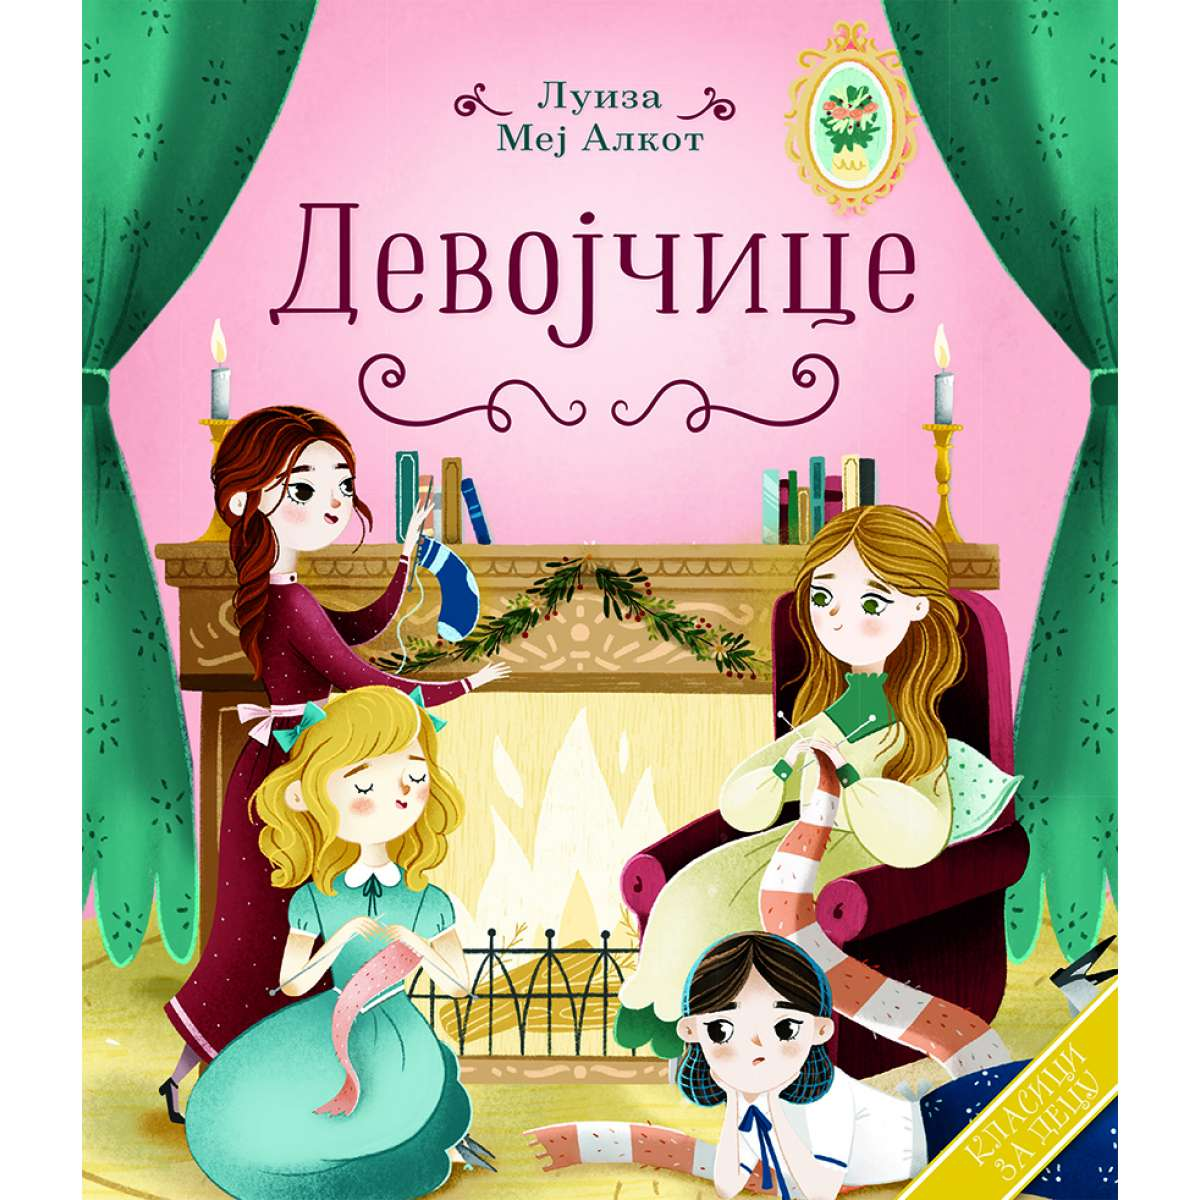 Klasici za decu: Devojčice